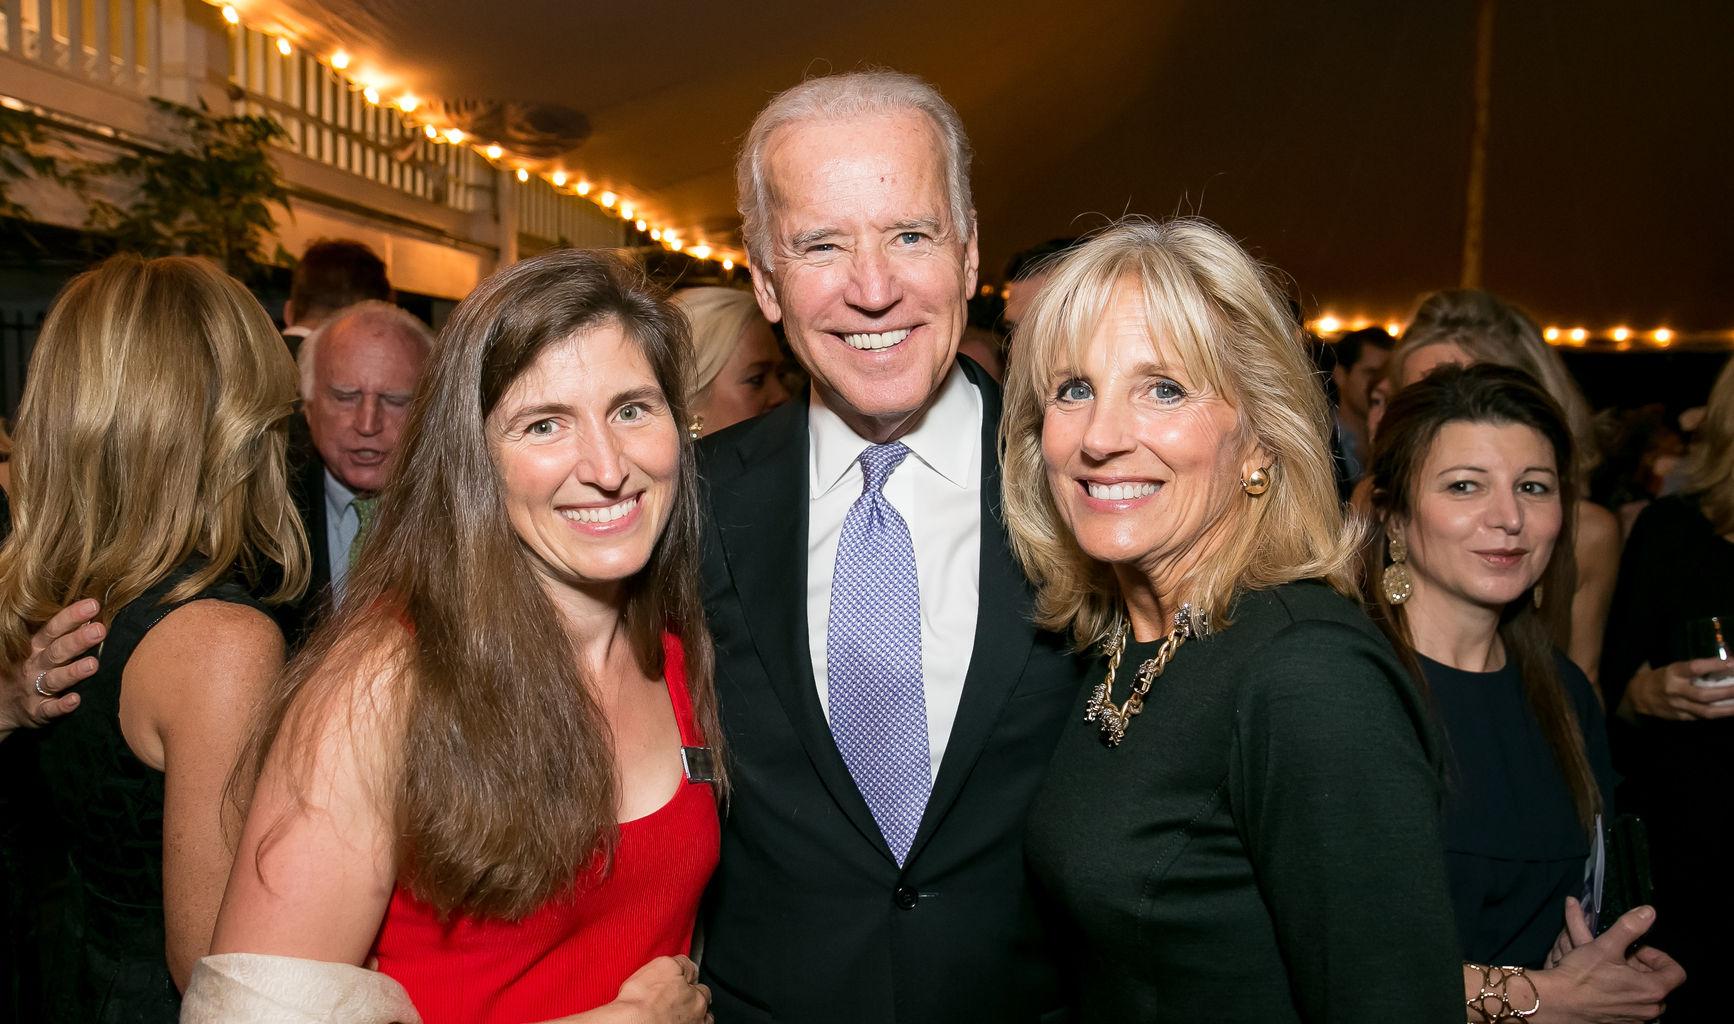 Catherine Crosland Jill Biden Joe Biden -.jpg